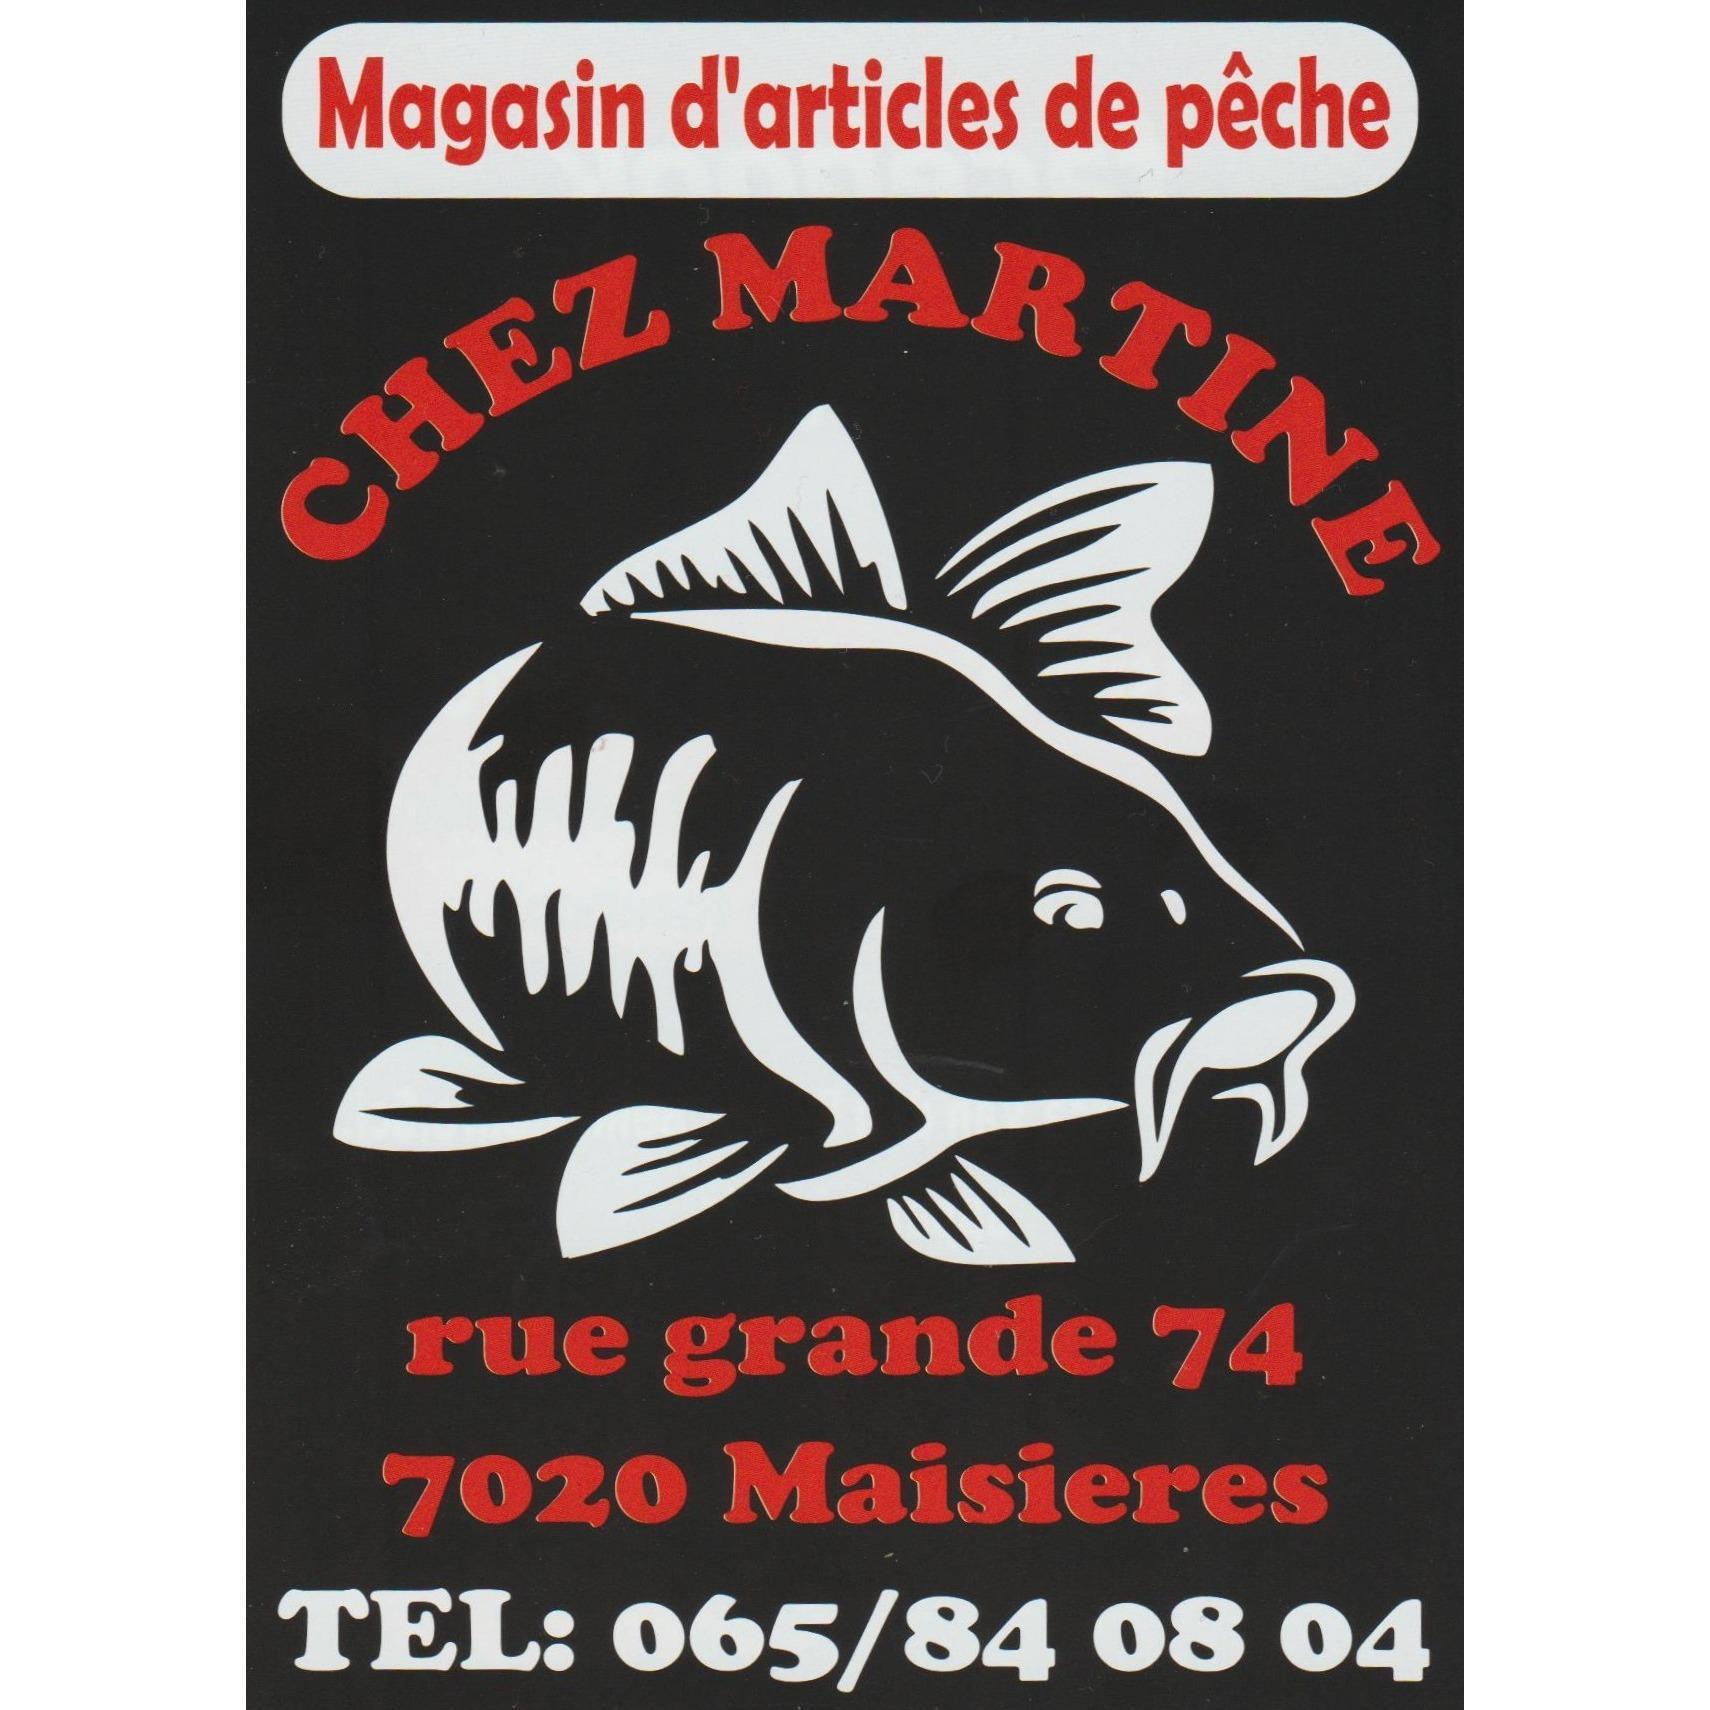 Chez Martine